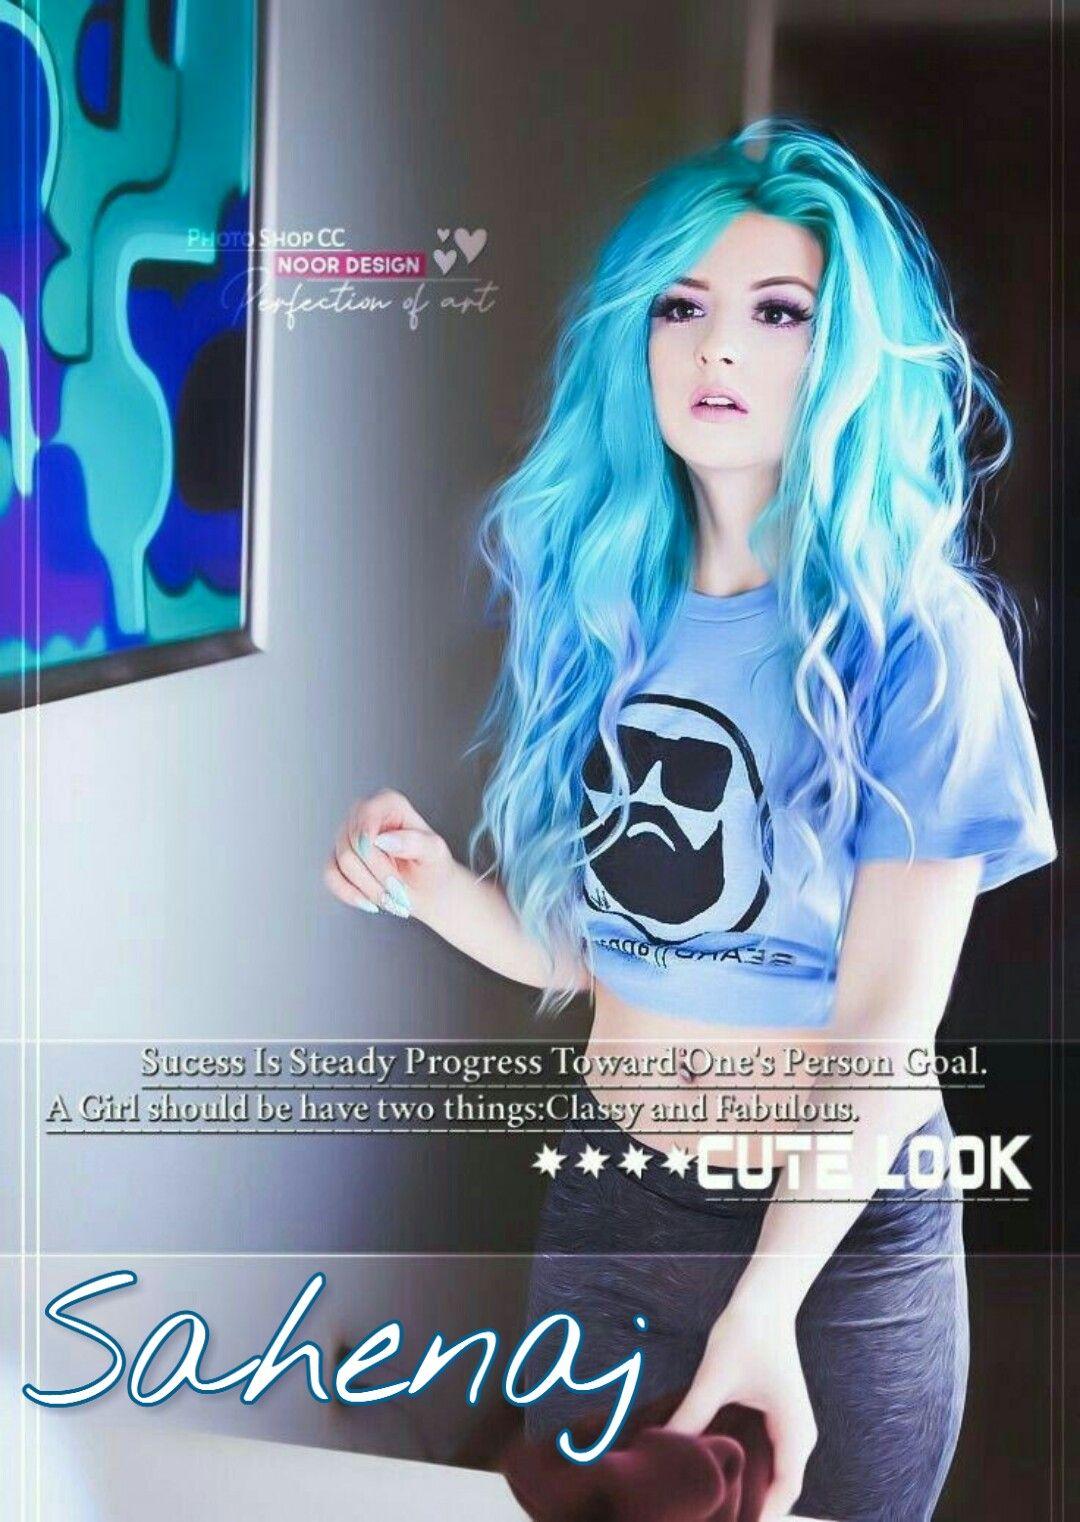 Blue Hair Girl Sahenaj Name Dp  Girl photo poses, Beautiful girl